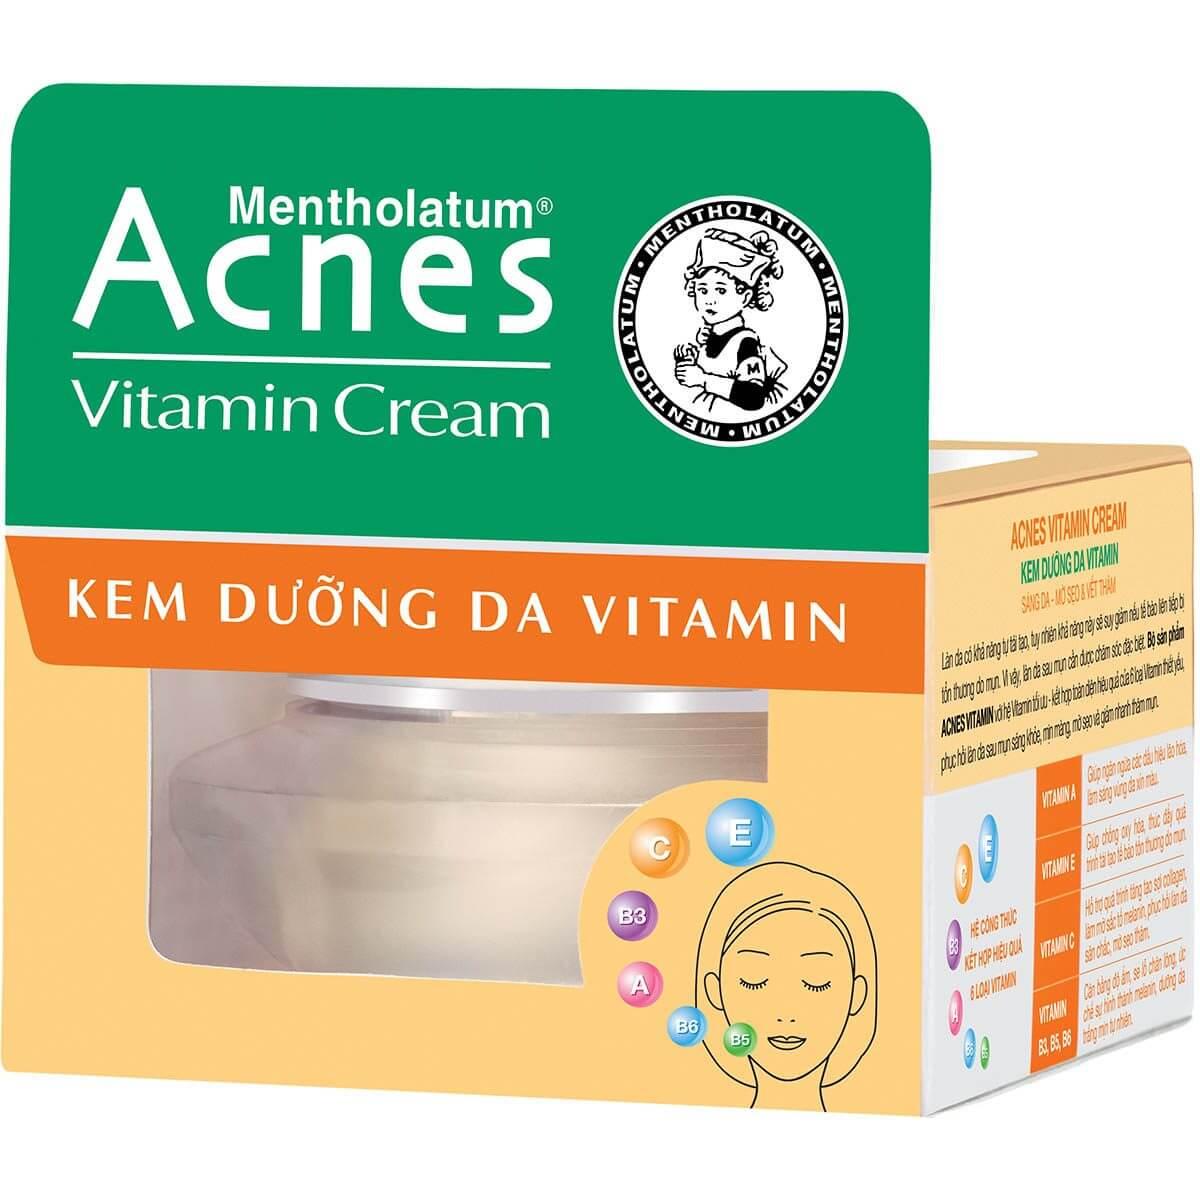 Acnes Vitamin Cream - Kem dưỡng da Vitamin